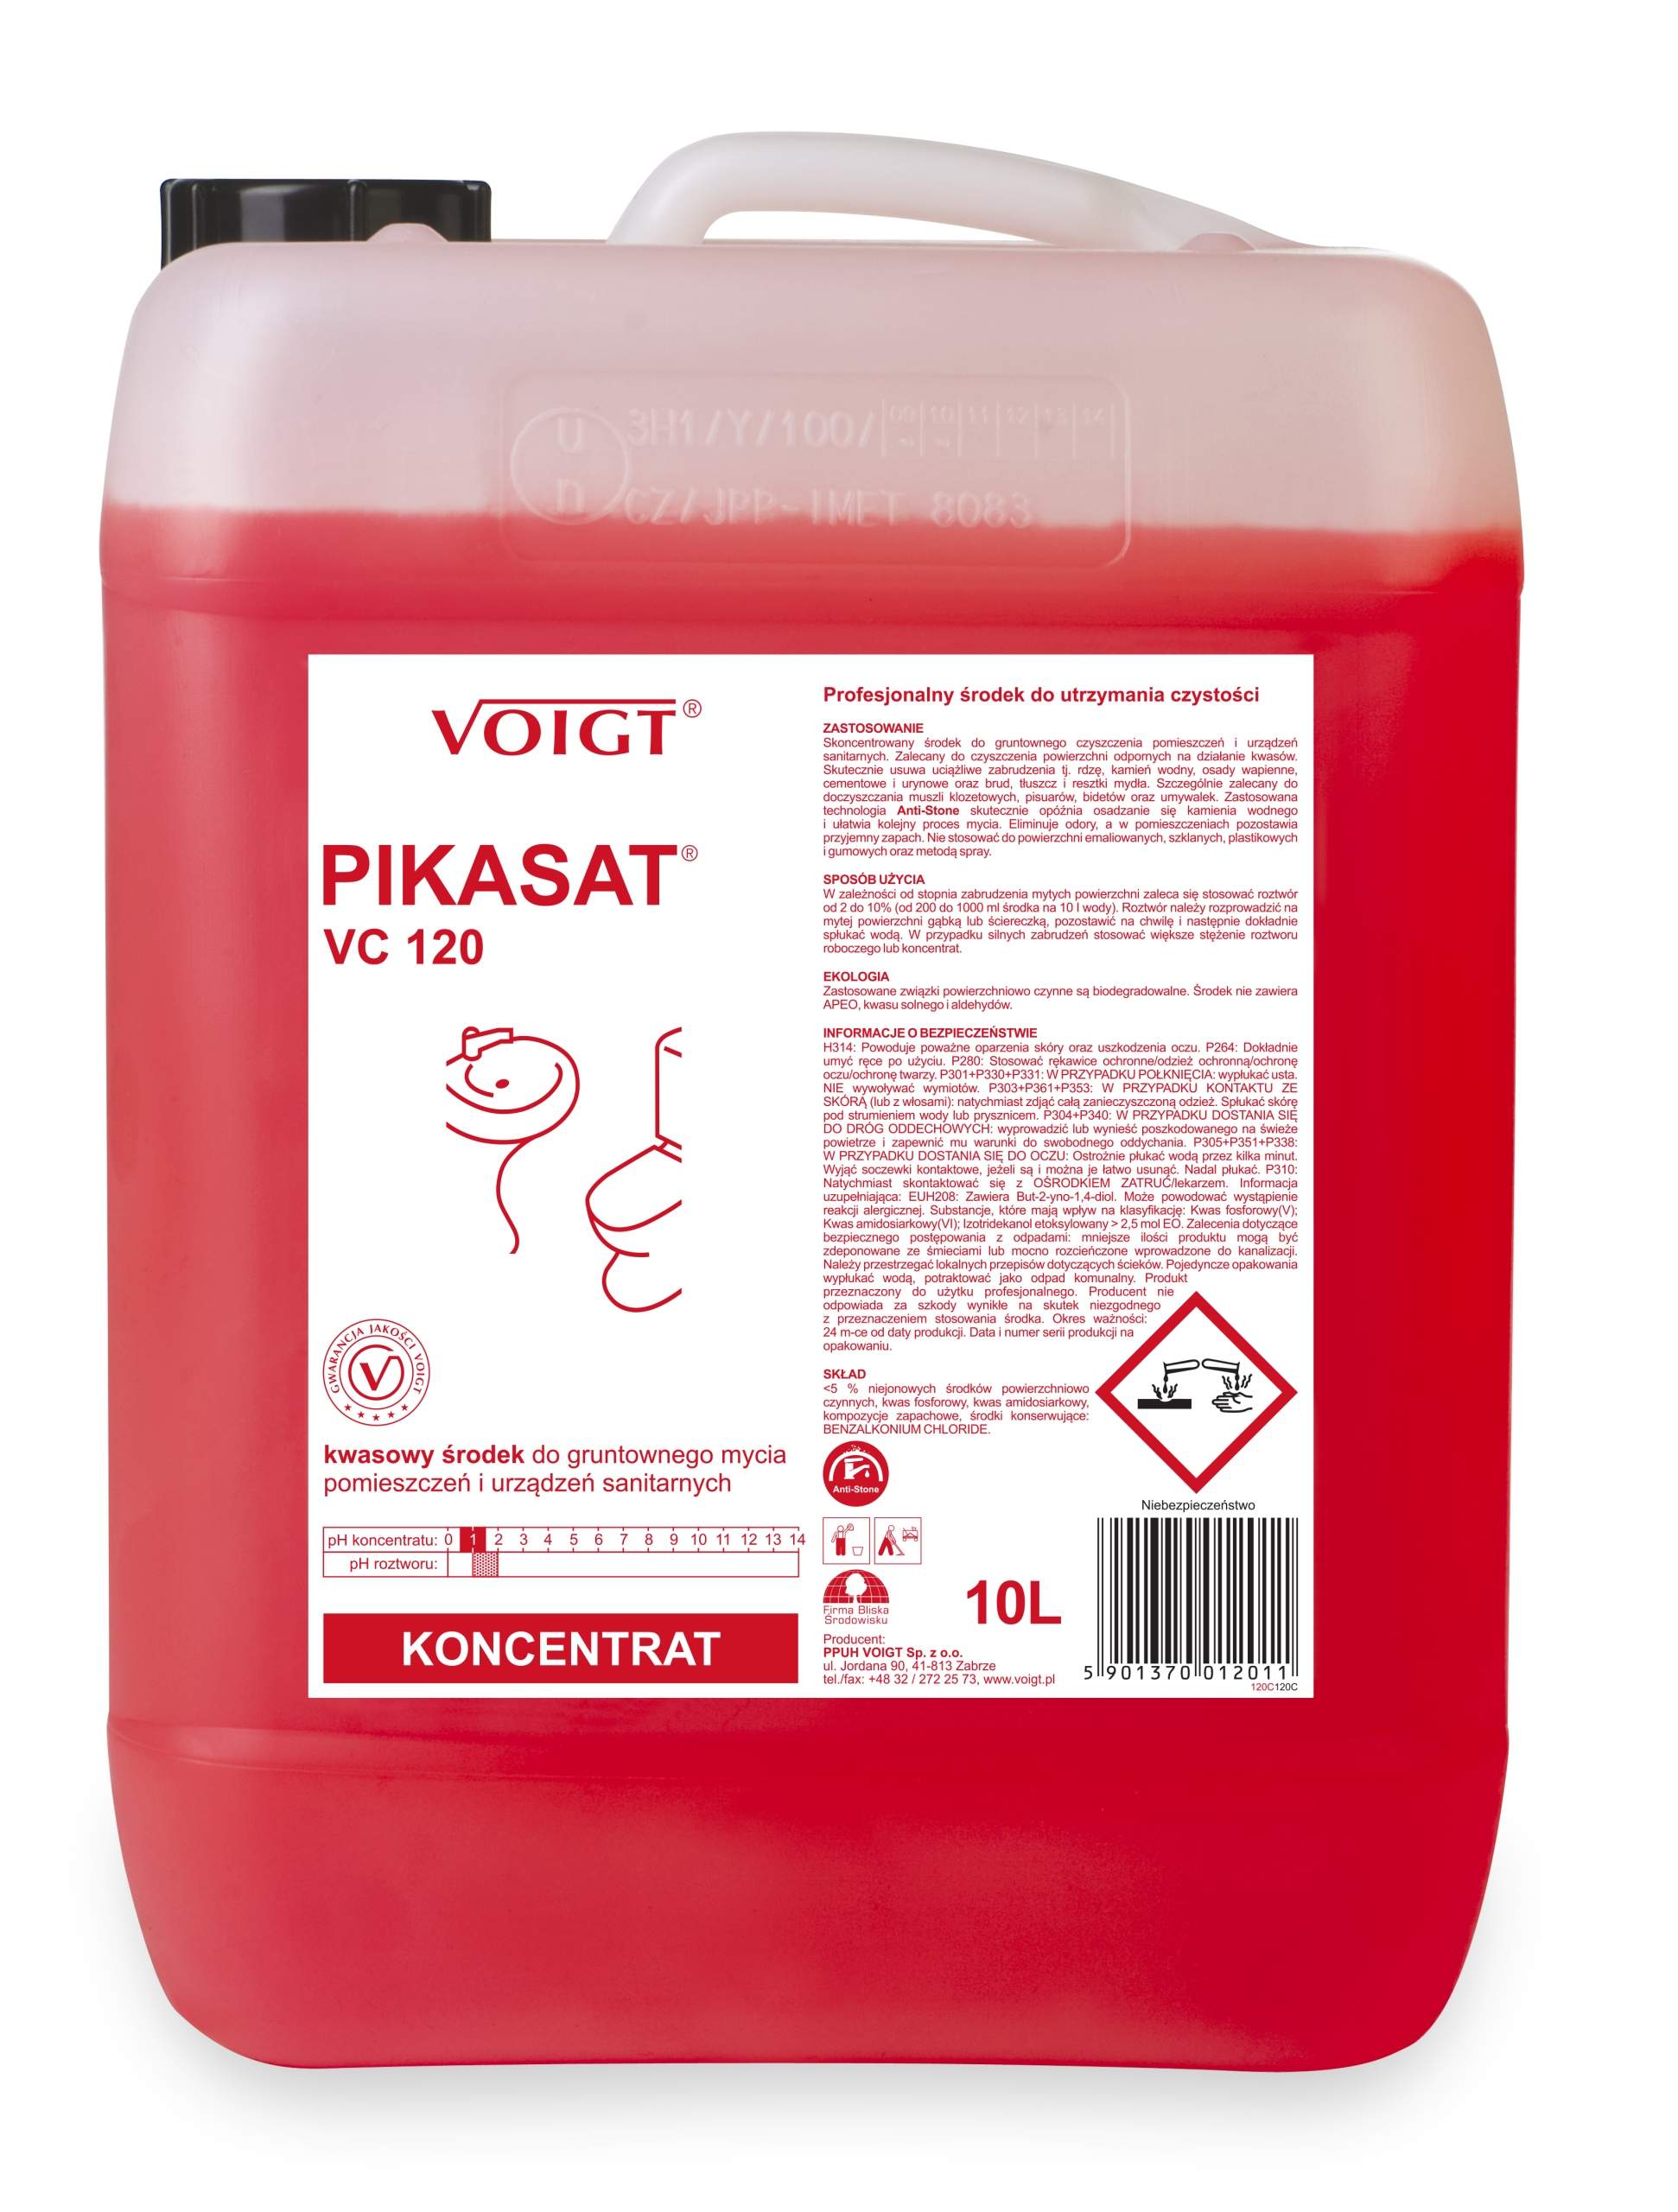 Voigt PIKASAT VC 120 do urządzeń sanitarnych 10 L 9398217734 - Allegro.pl